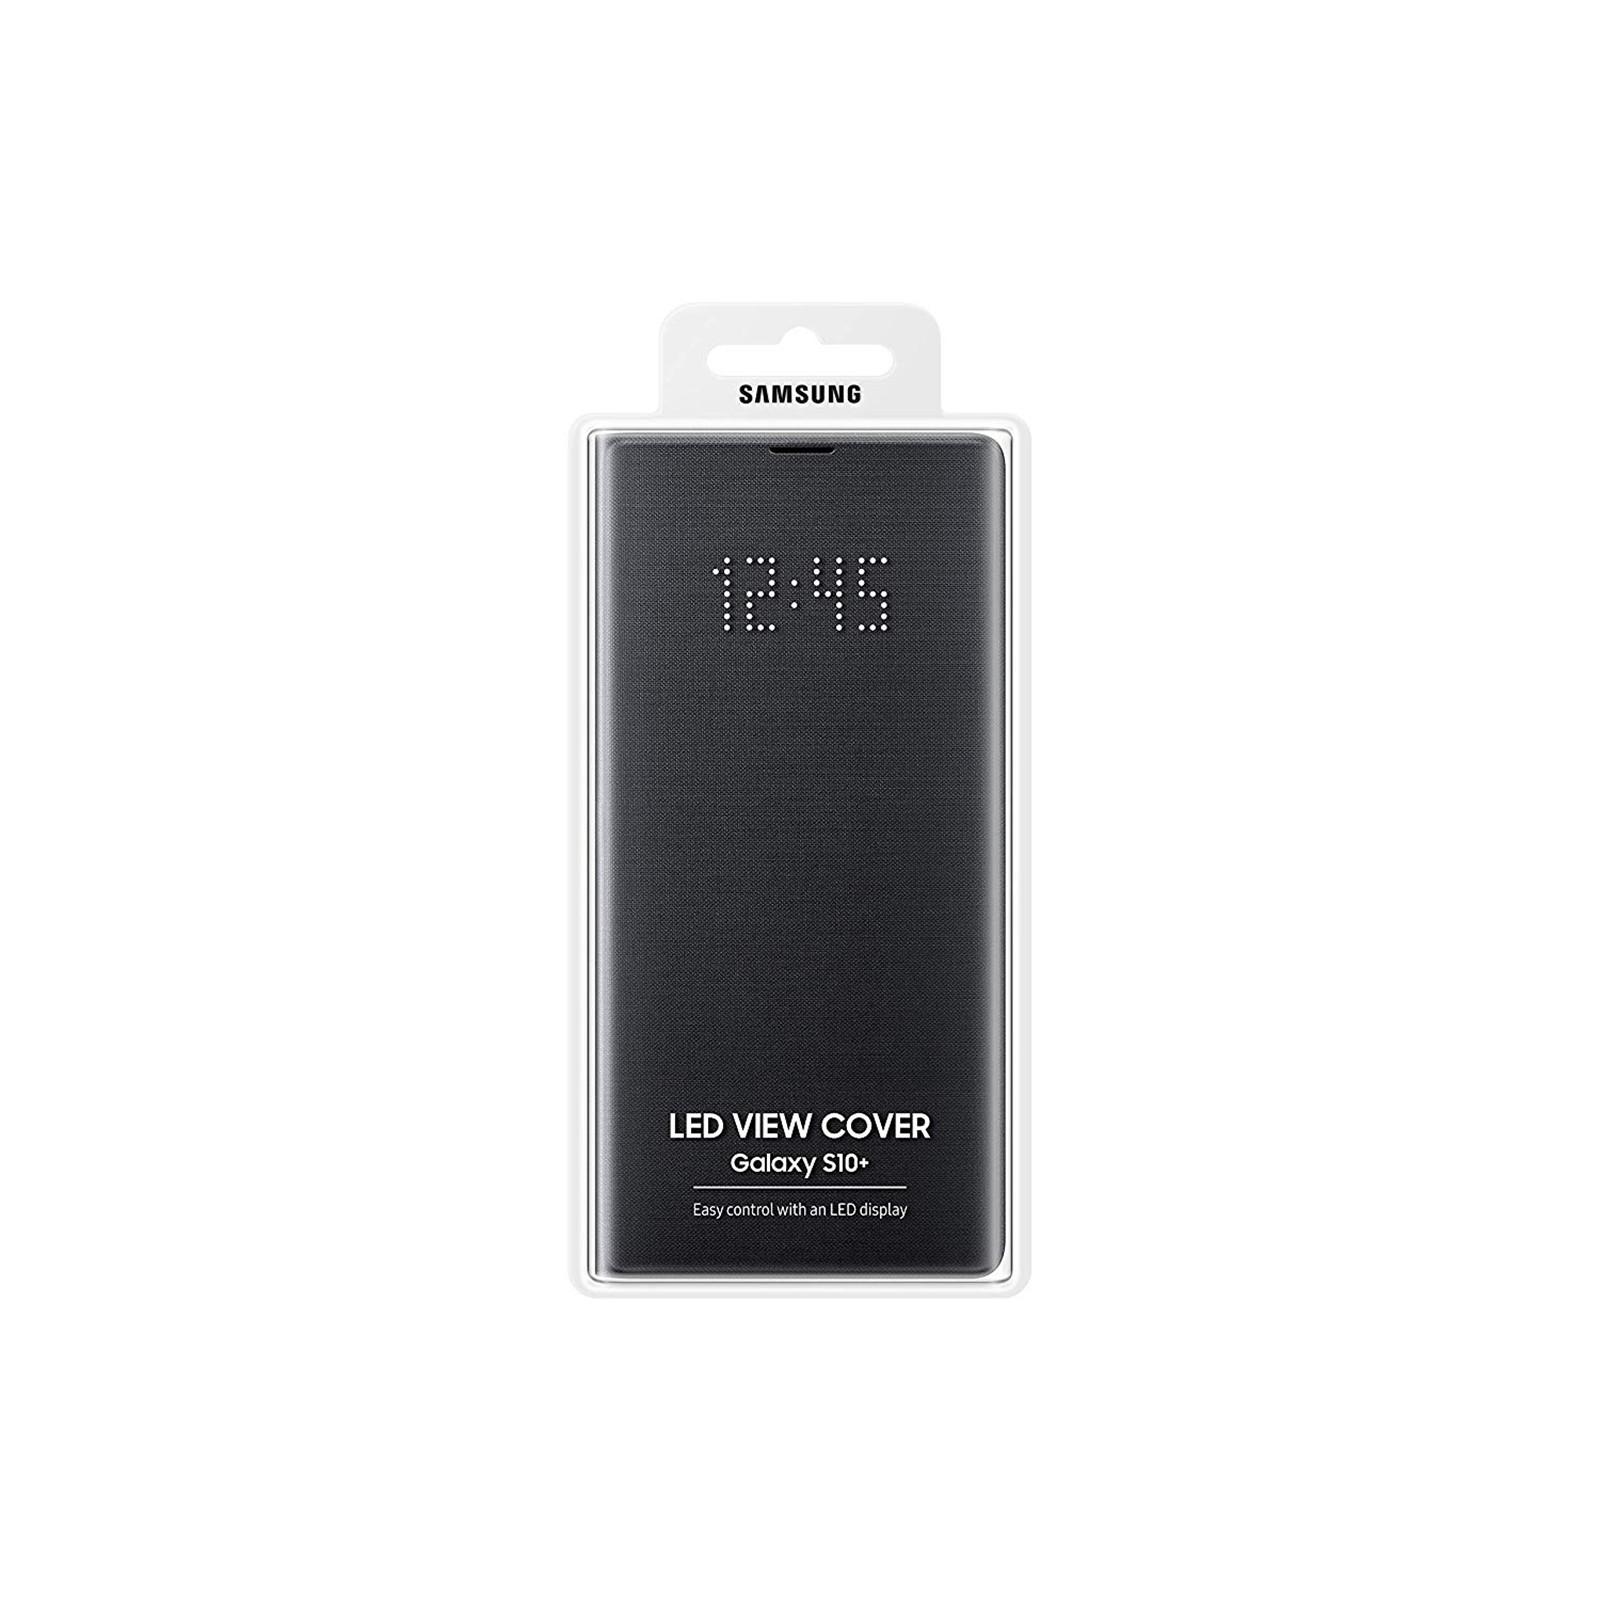 huge discount b1fa9 fe1c8 Buy the Samsung Galaxy S10+ LED View Flip Cover- Black,Light Alerts,LED...  ( EF-NG975PBEGWW ) online